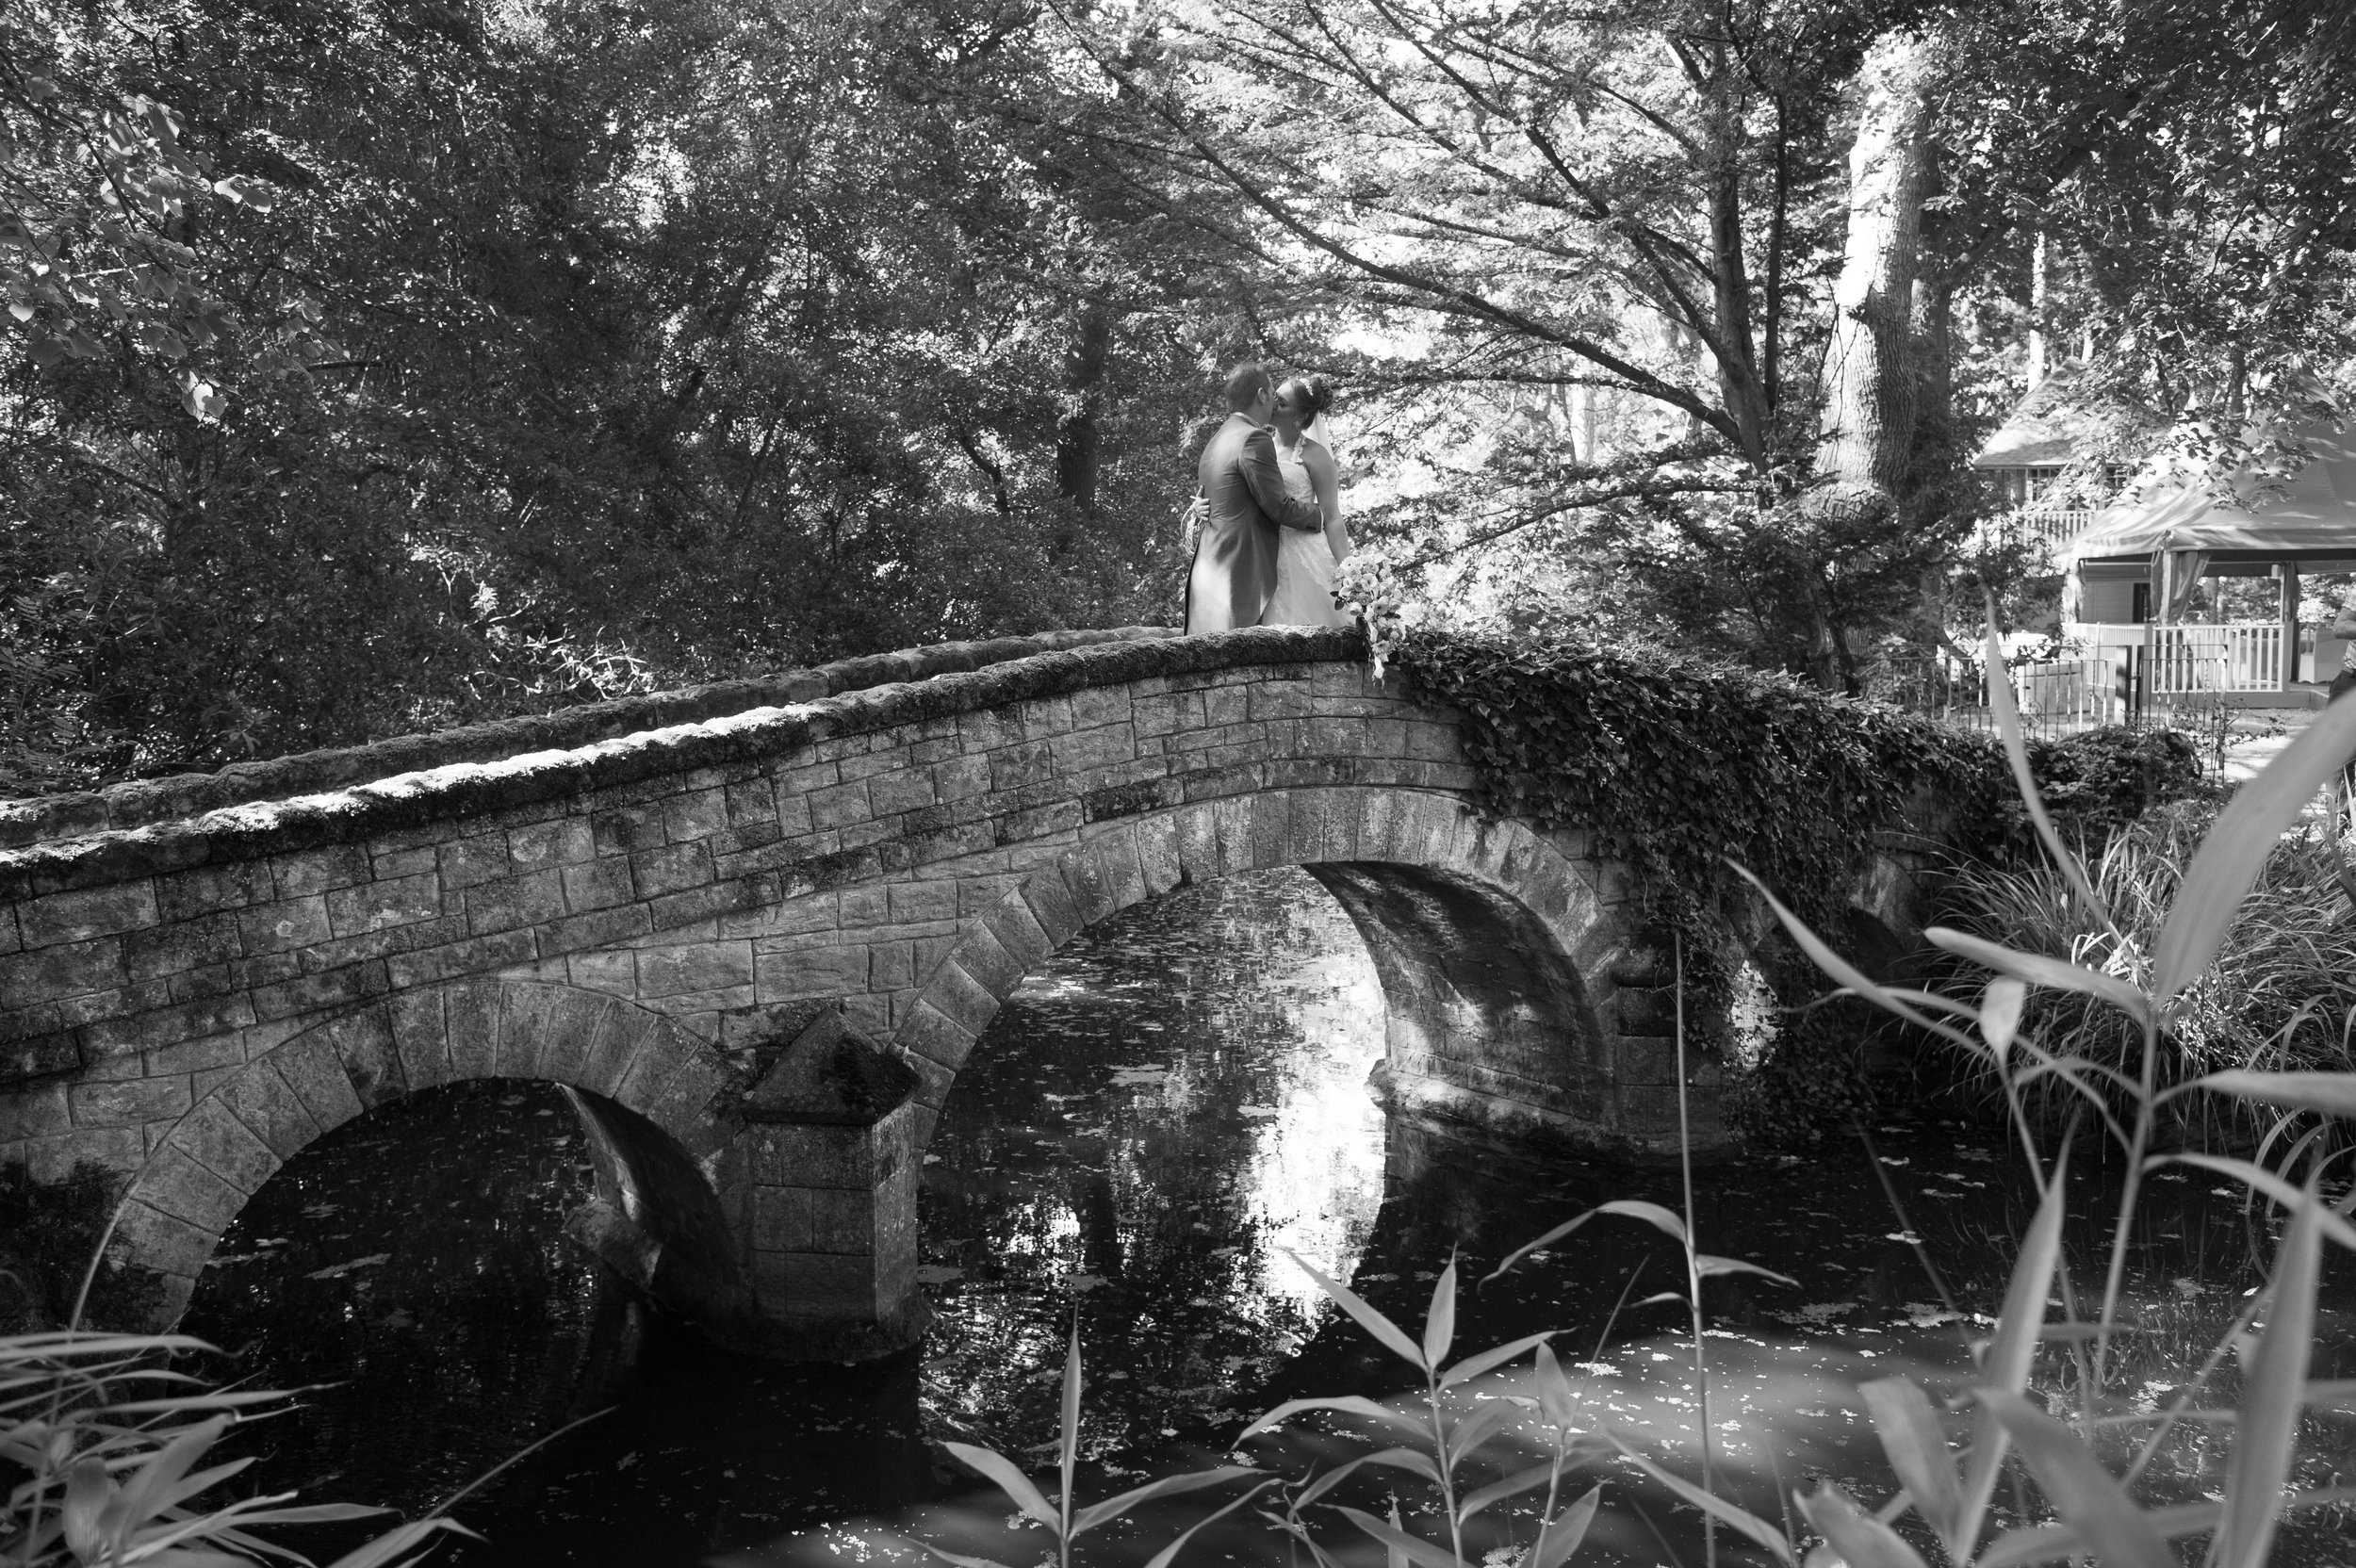 Bride and Groom kiss on the stone bridge Hogarths Hotel Solihull